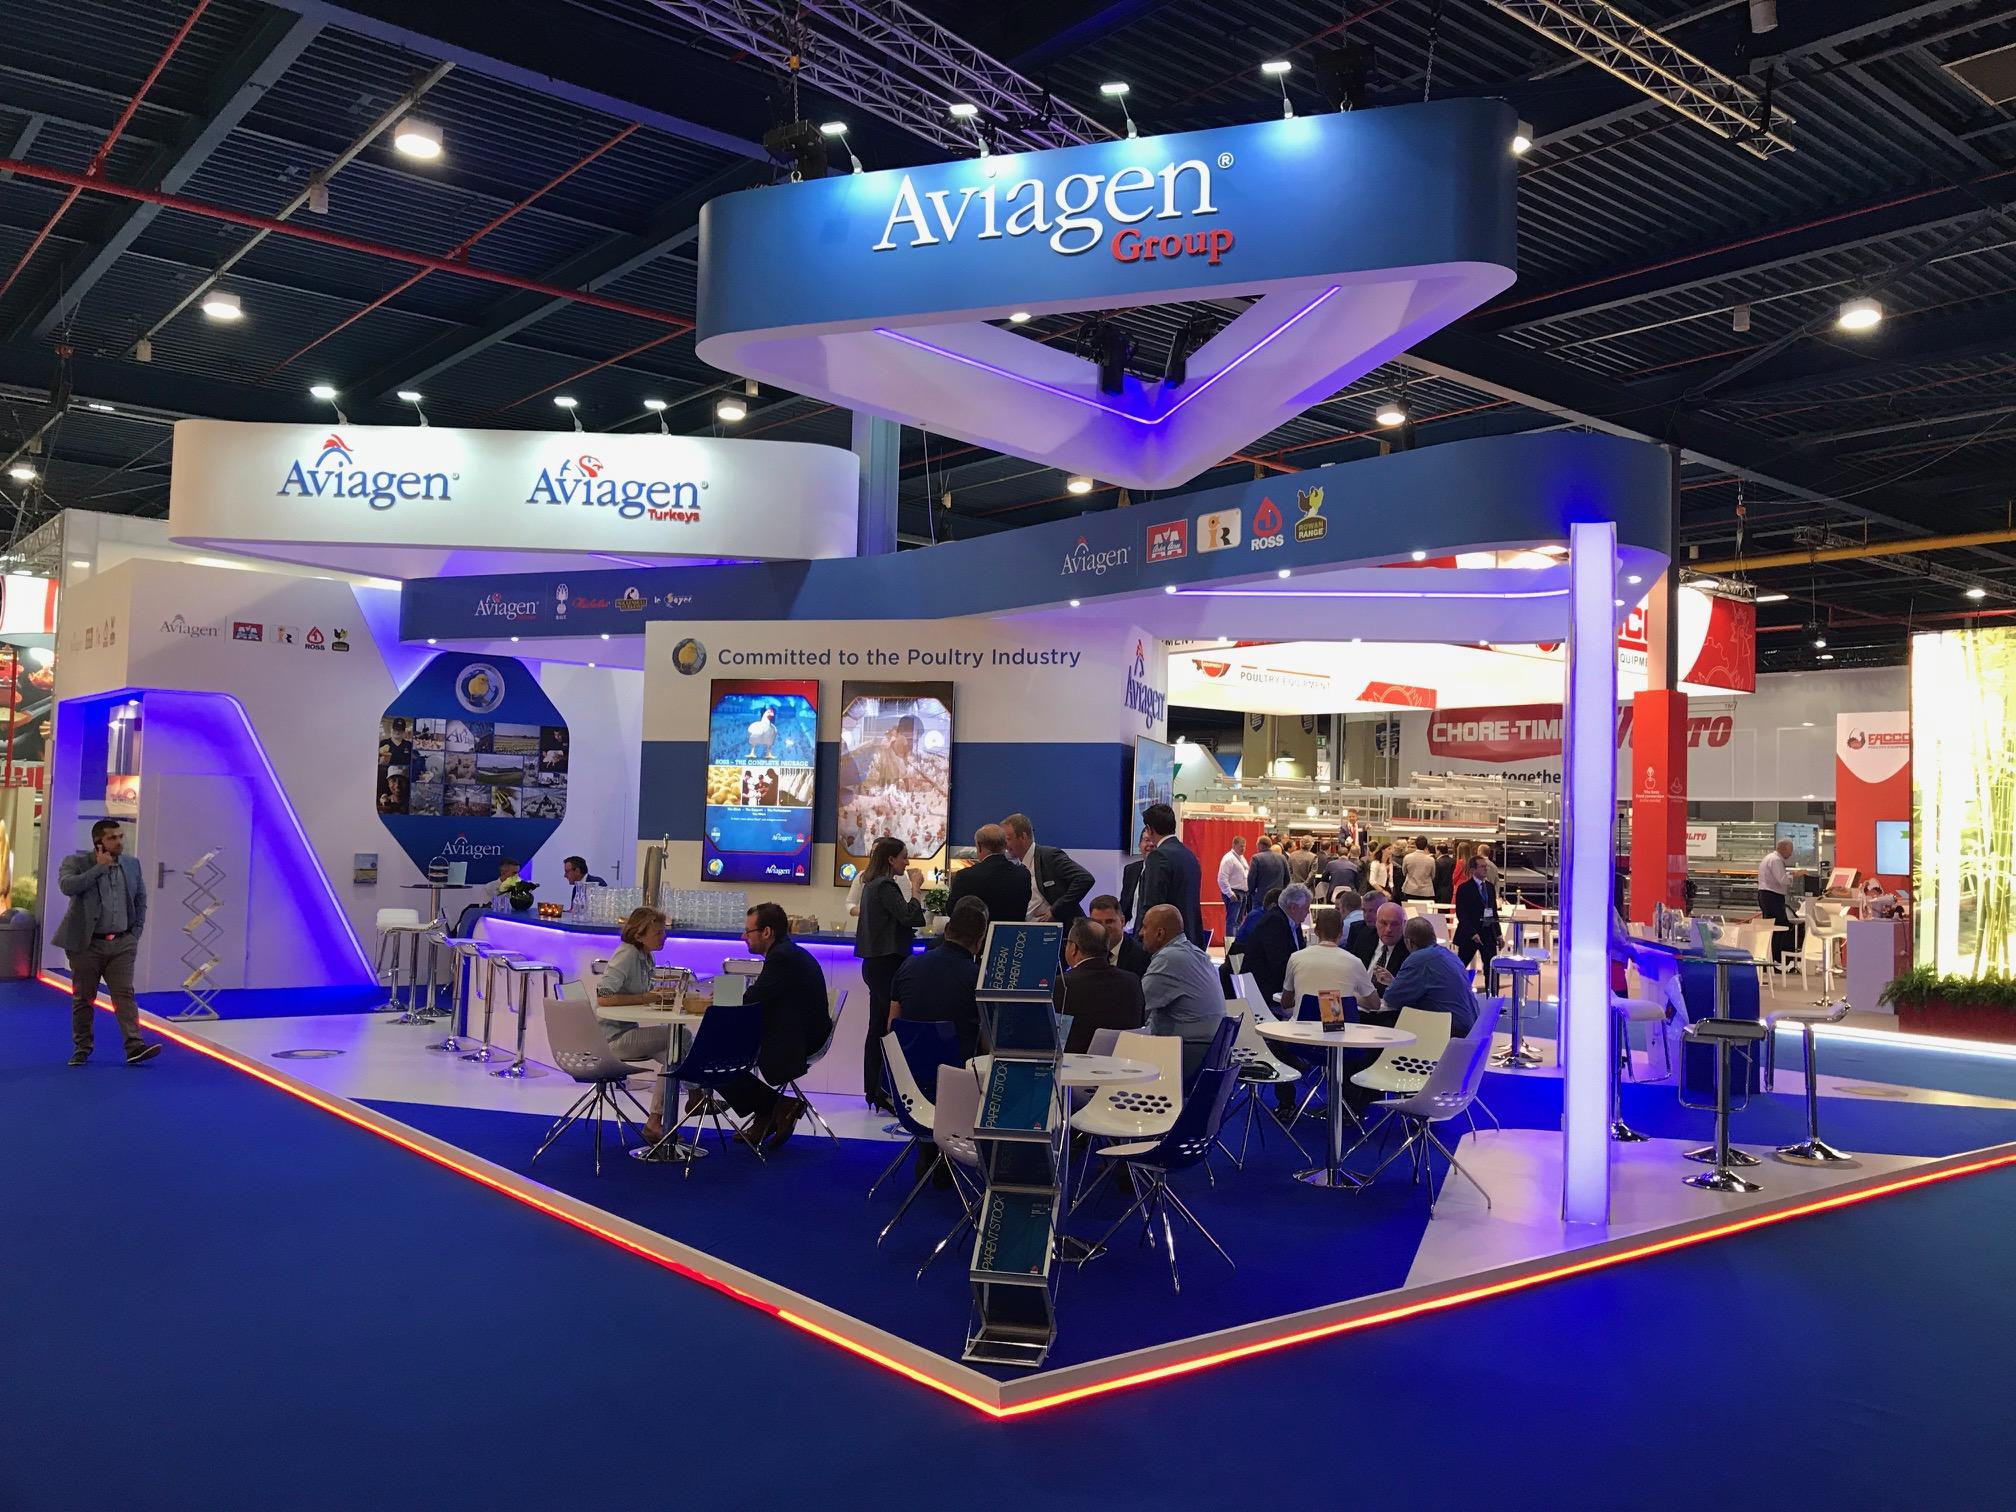 Aviagen at VIV Europe 2018 Utrecht bespoke exhibition stand design and build